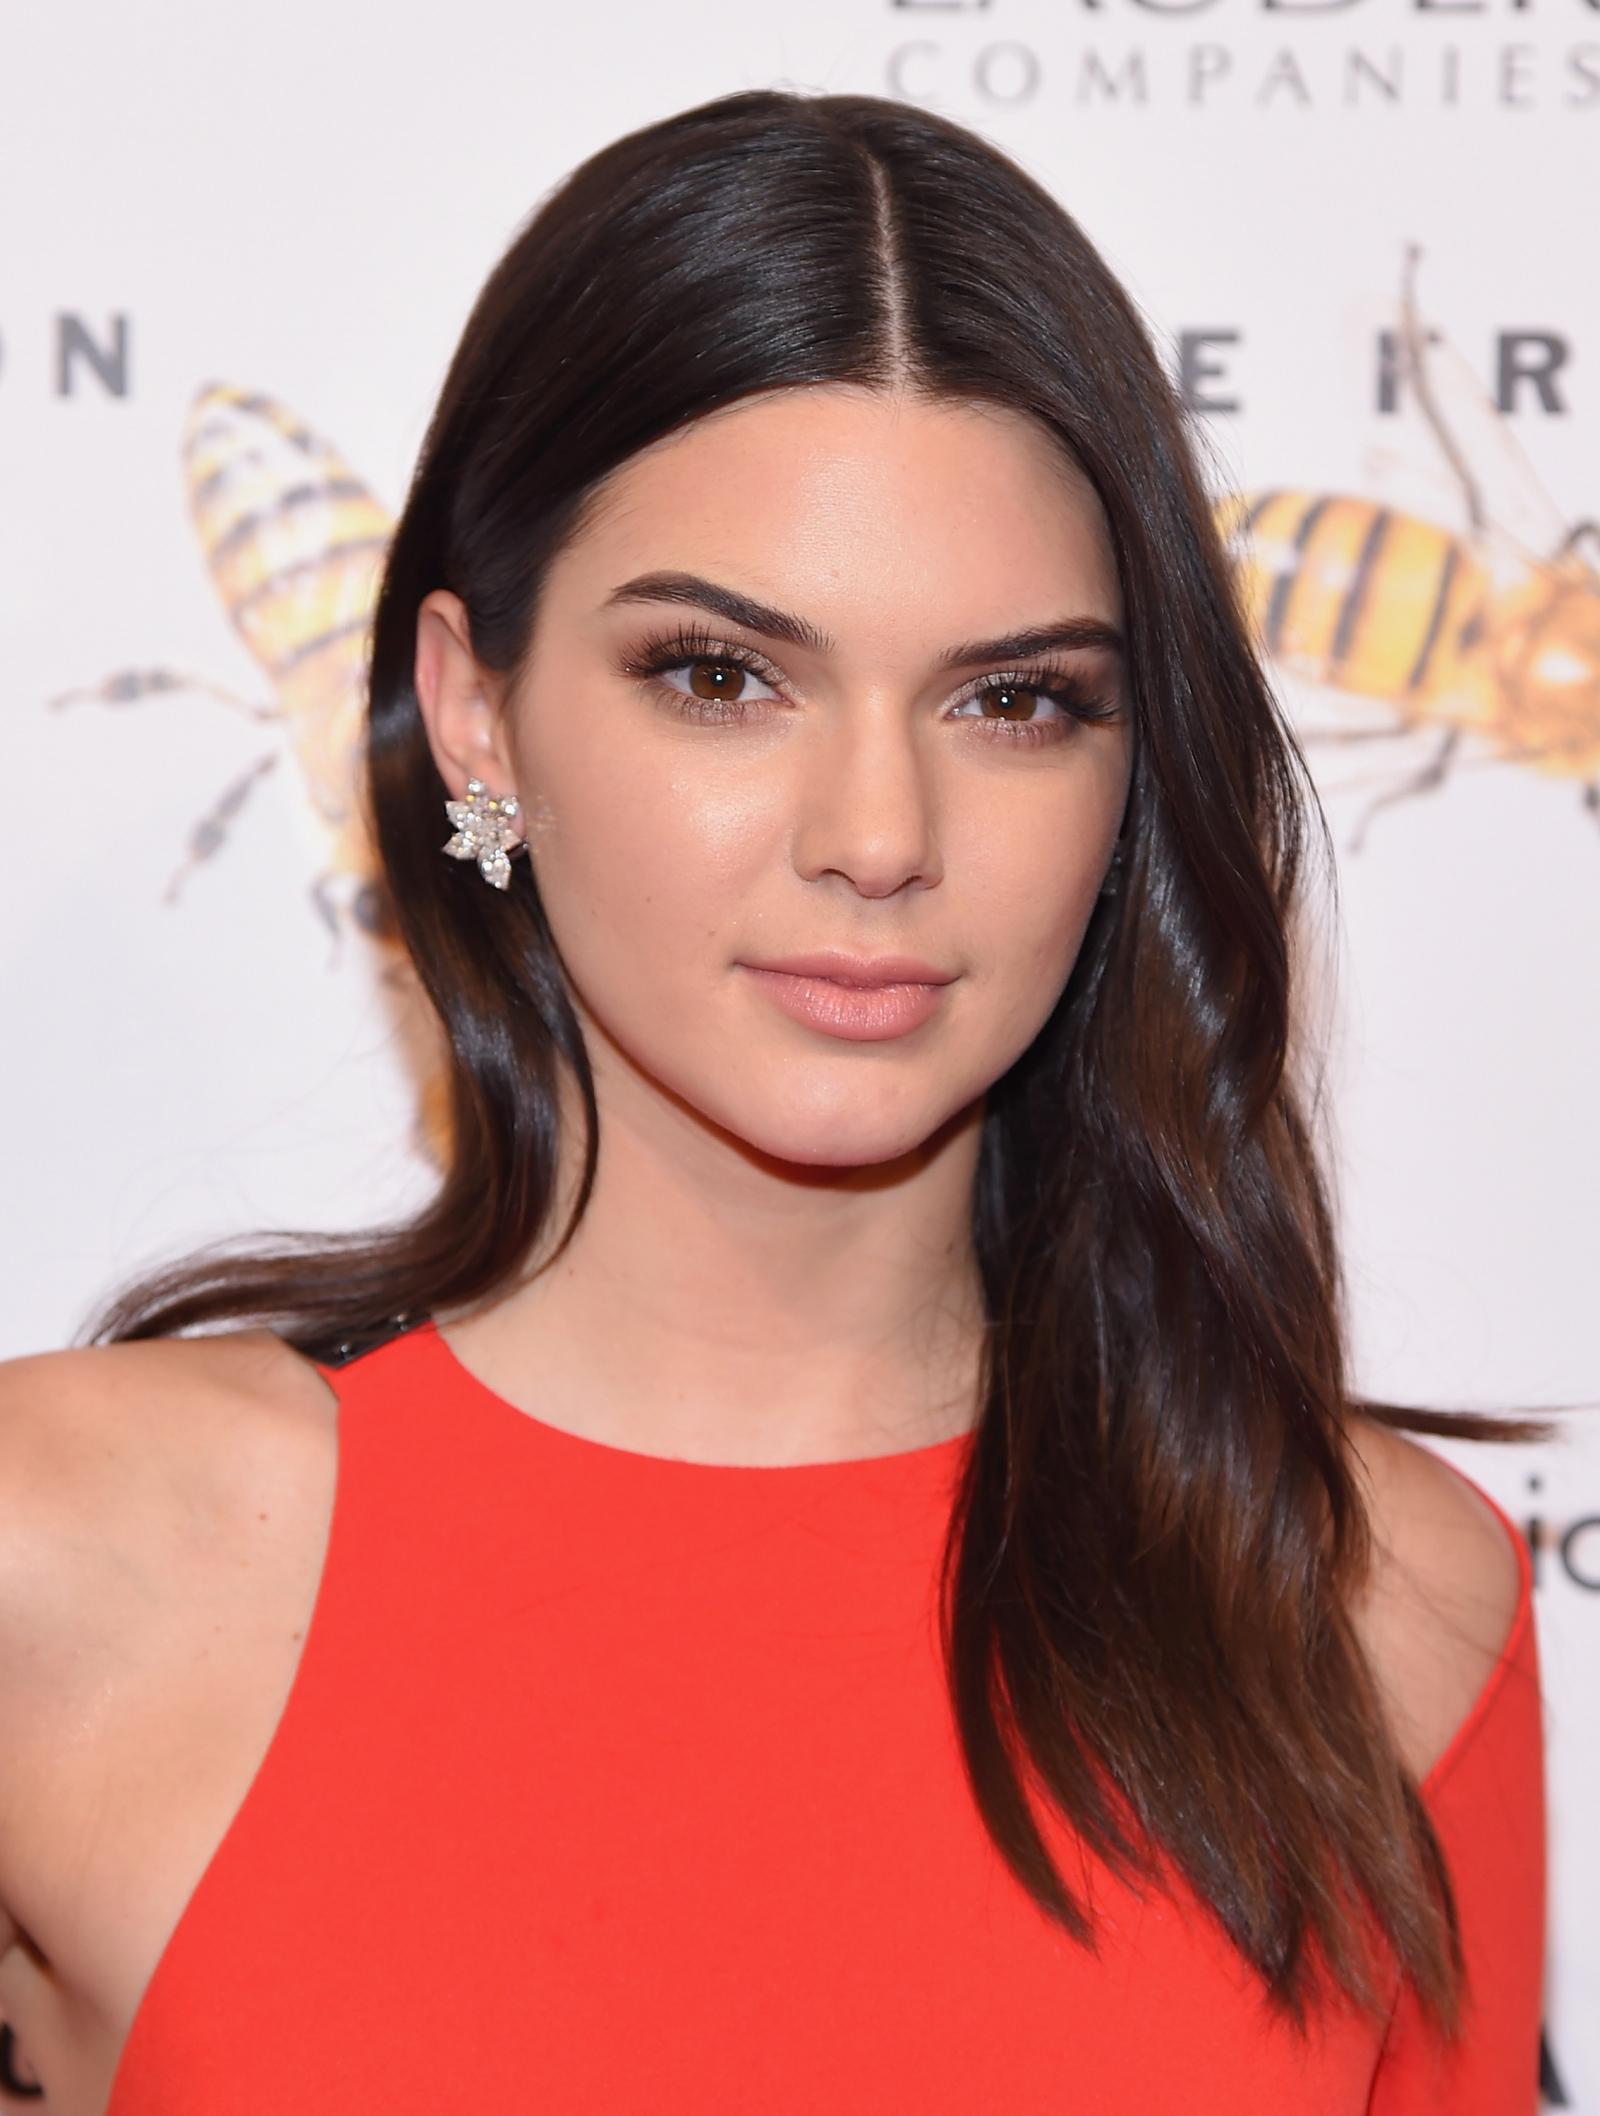 Kendall Jenner 2018 Hair Eyes Feet Legs Style Weight